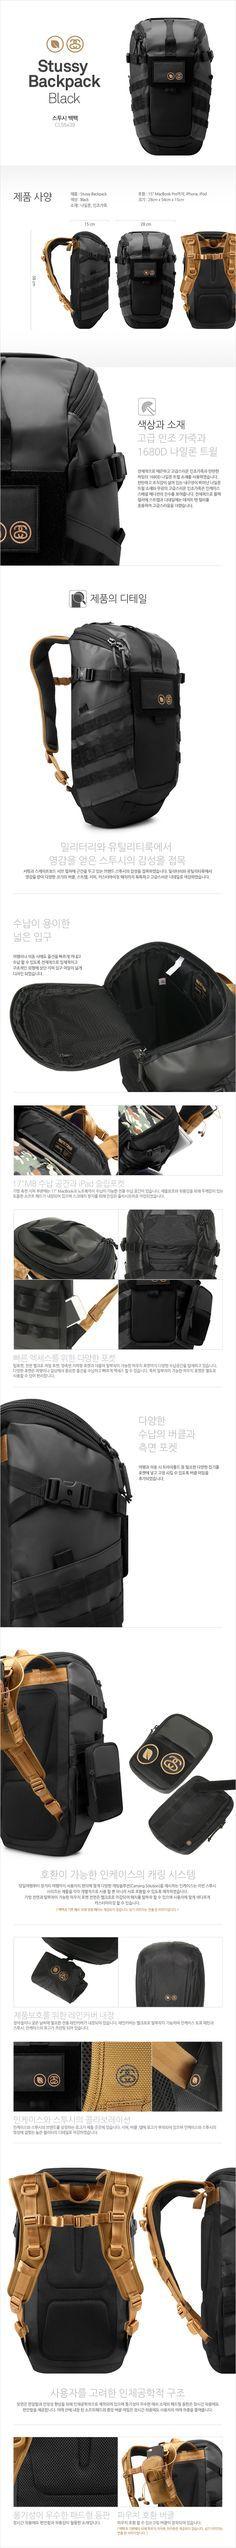 Stussy Backpack - Incase Korea #interface #ui #web